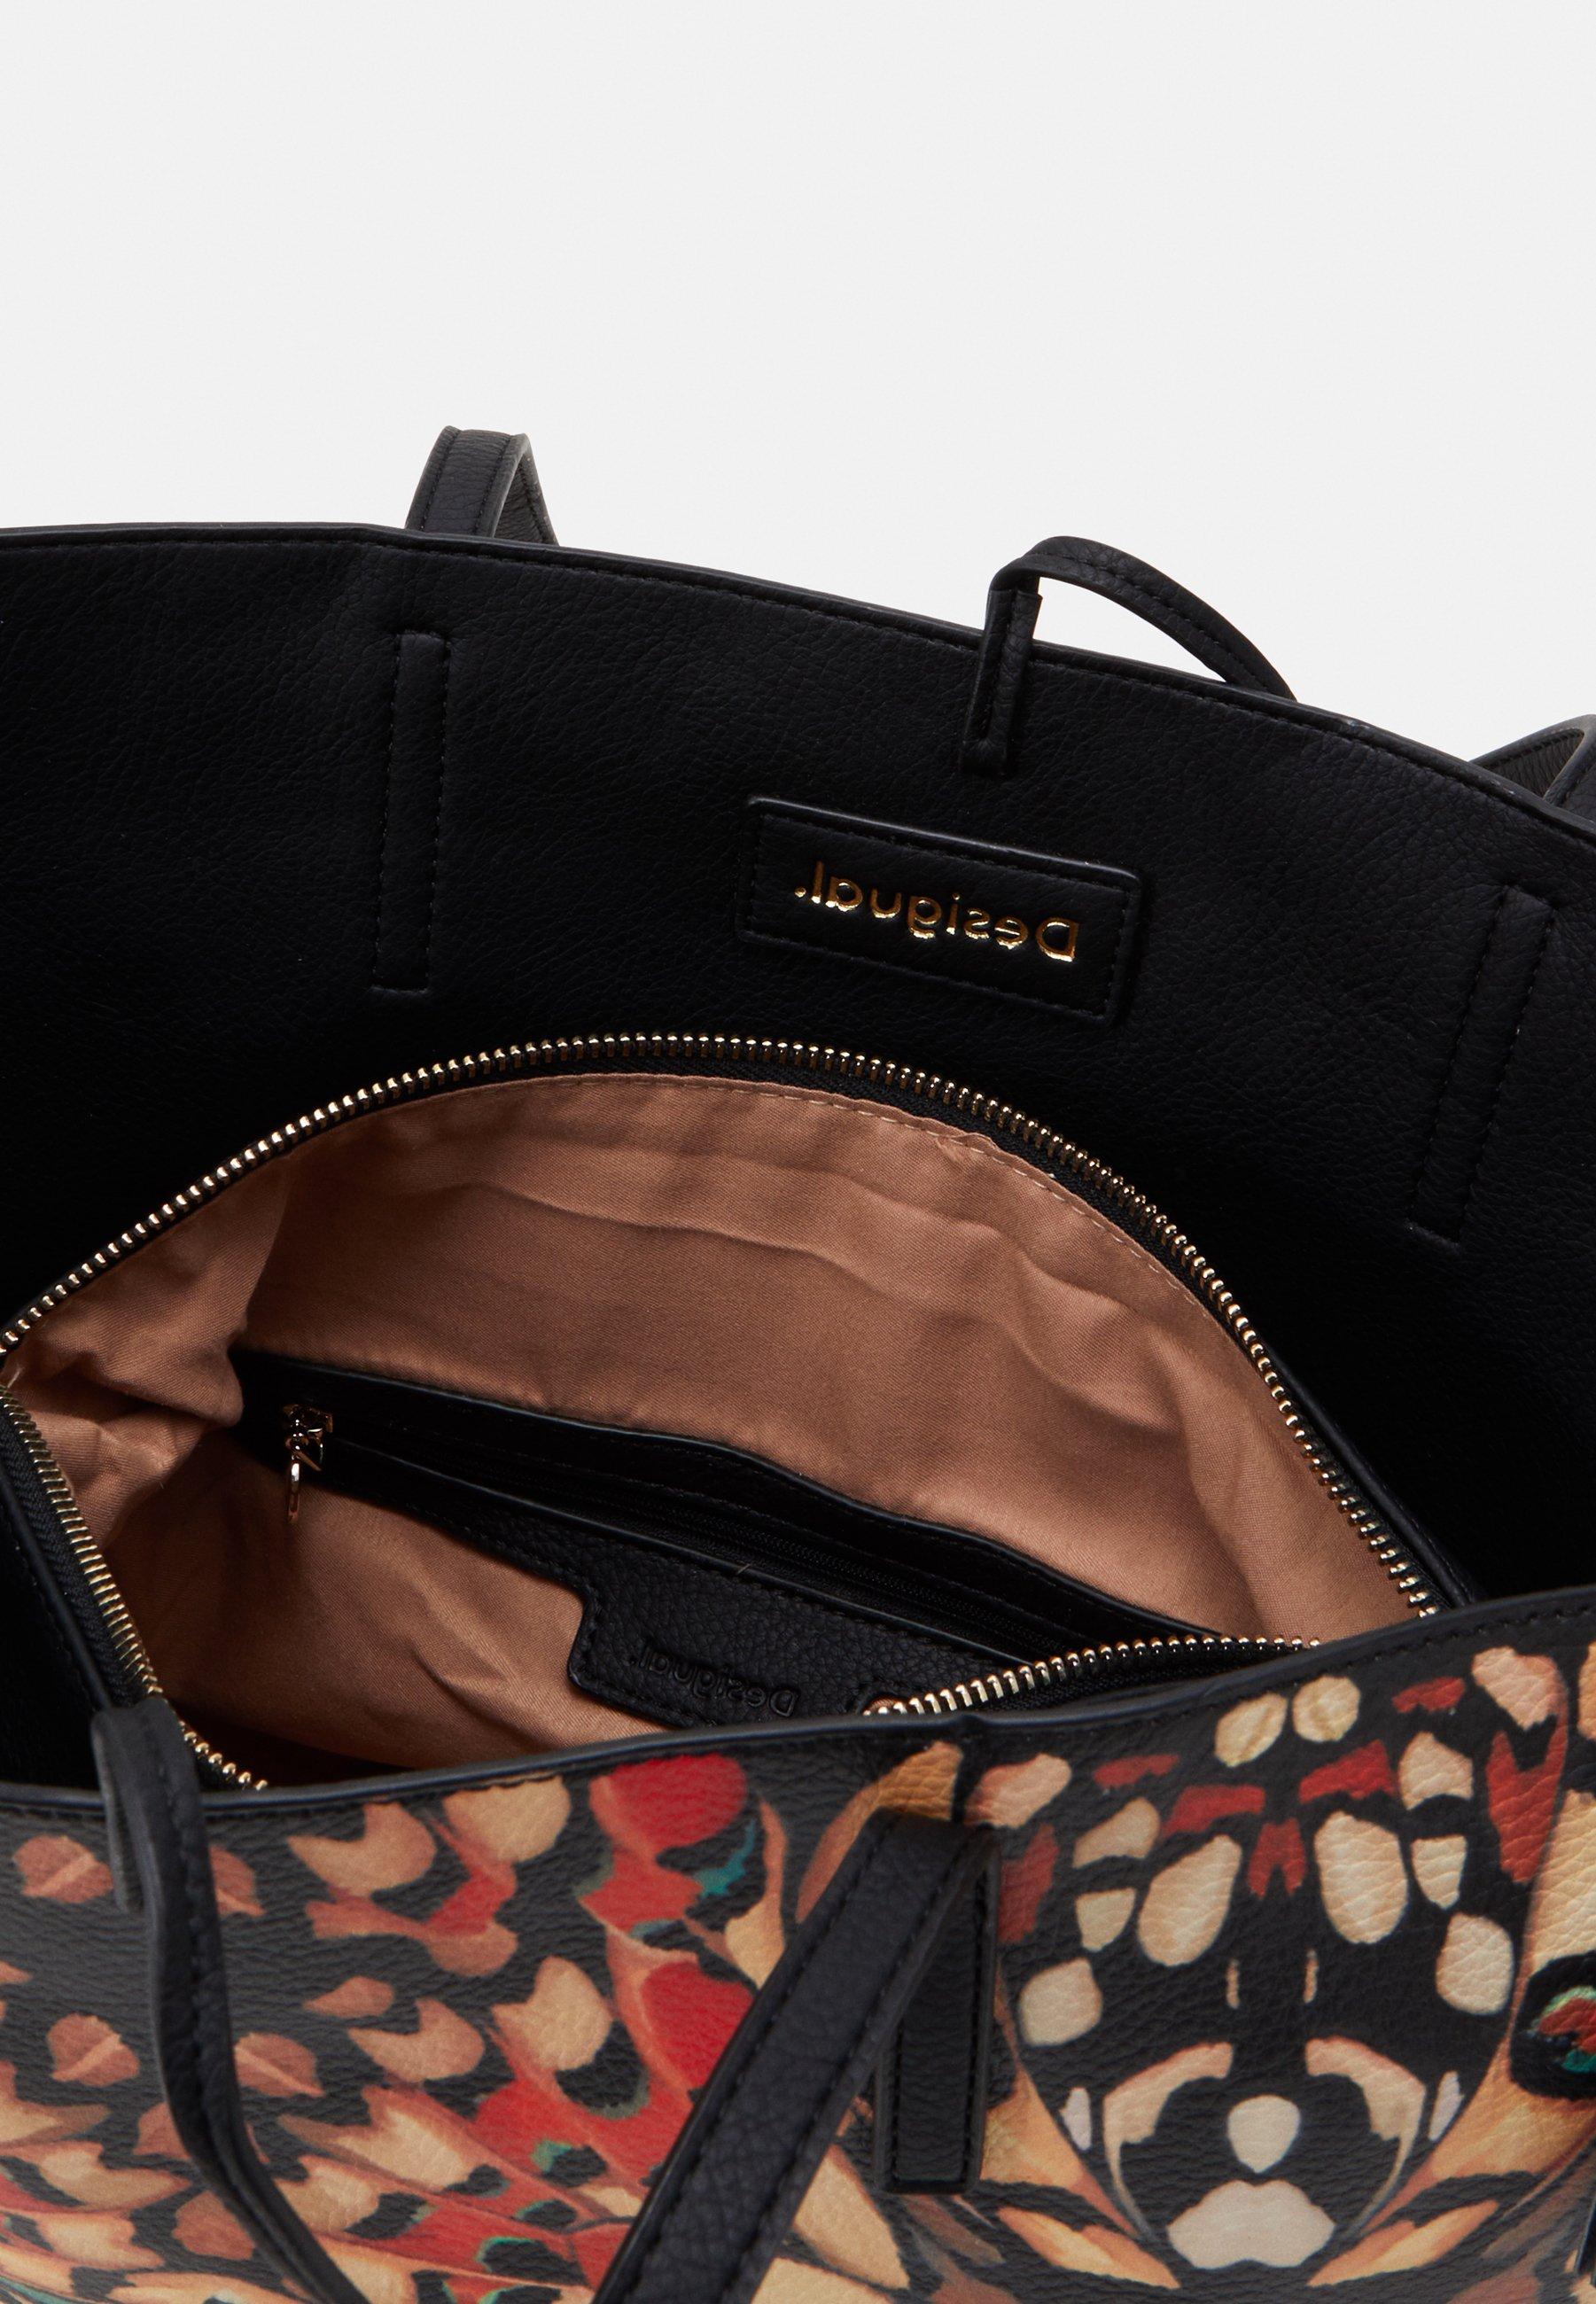 Good Service Factory Sale Accessories Desigual CHRYSALIS SICILIA Handbag multicoloured U8UAiA8yv u7KJjt3Fc